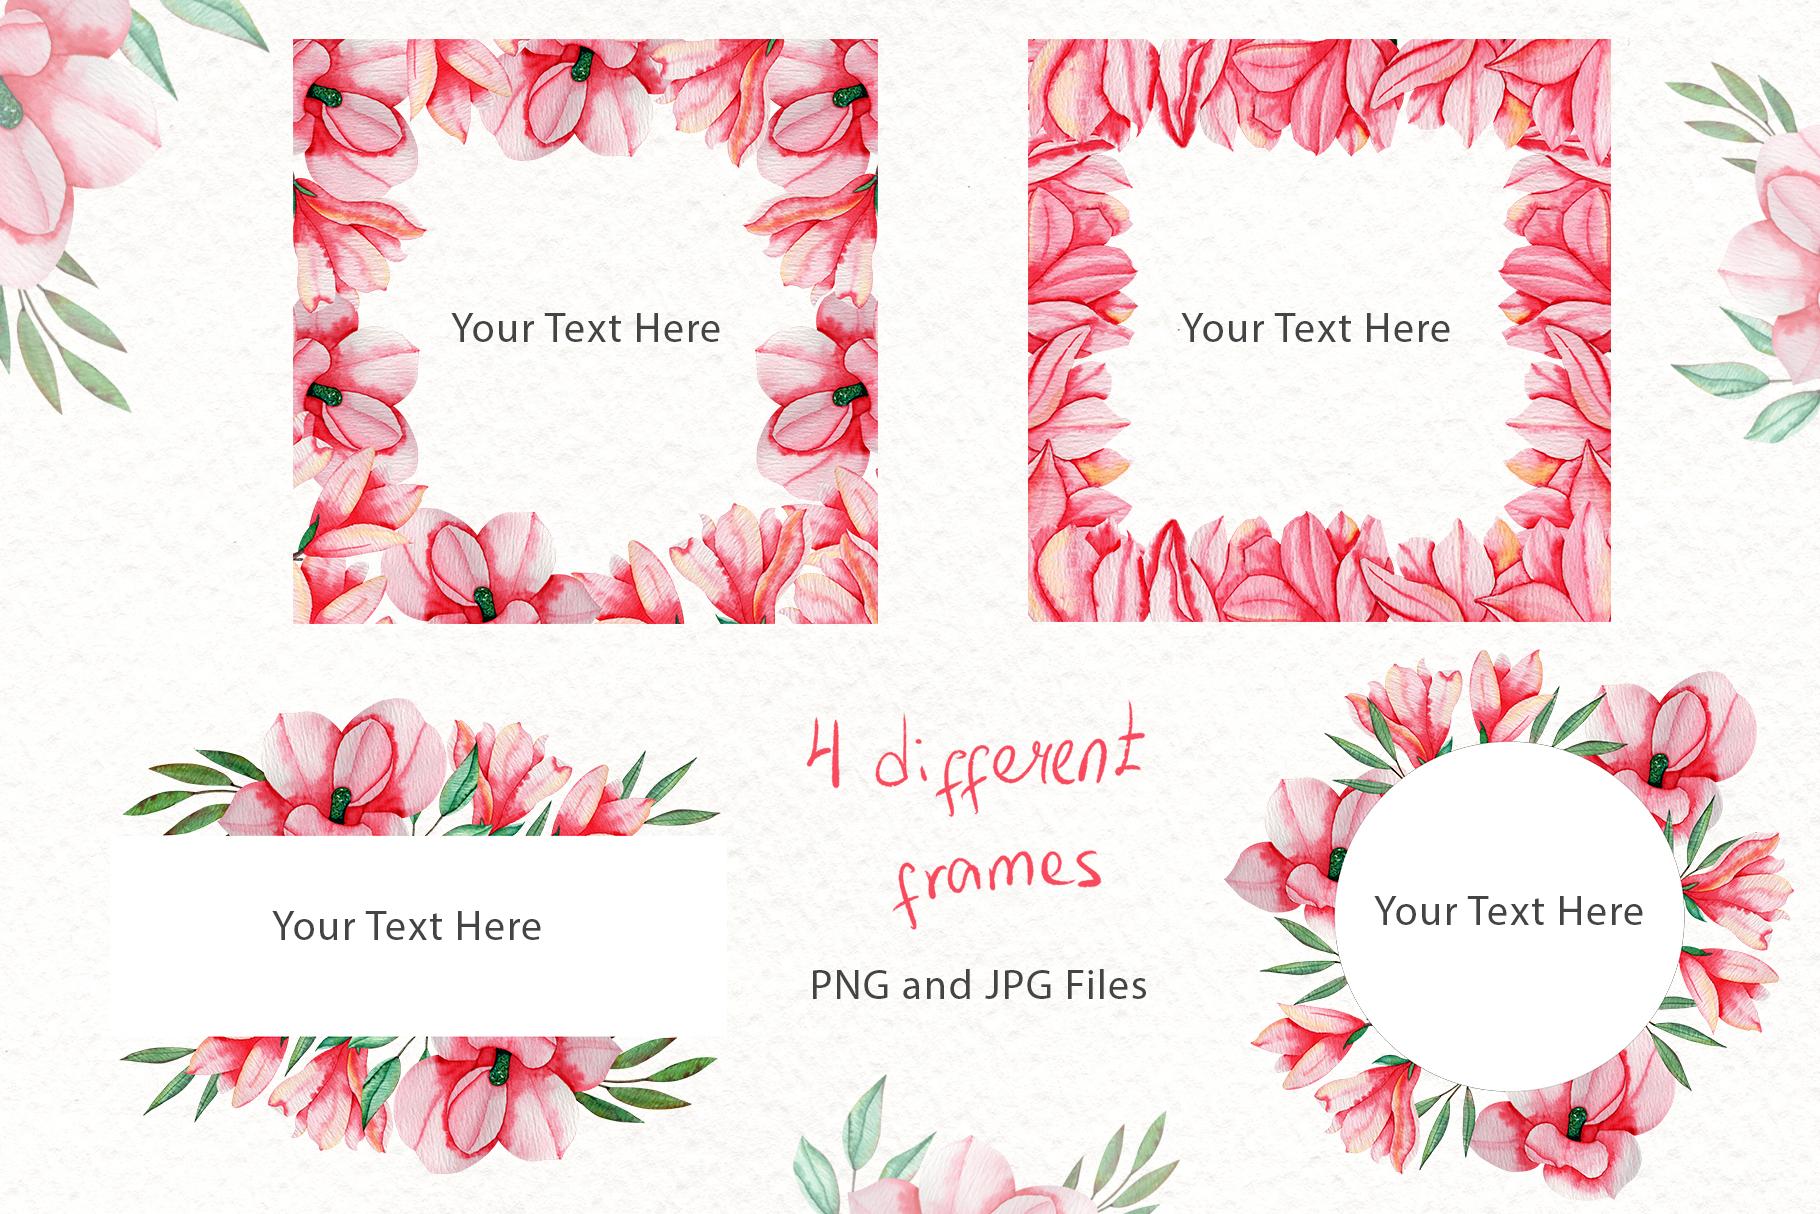 Magnolia Dream - Watercolor Illustrations example image 5